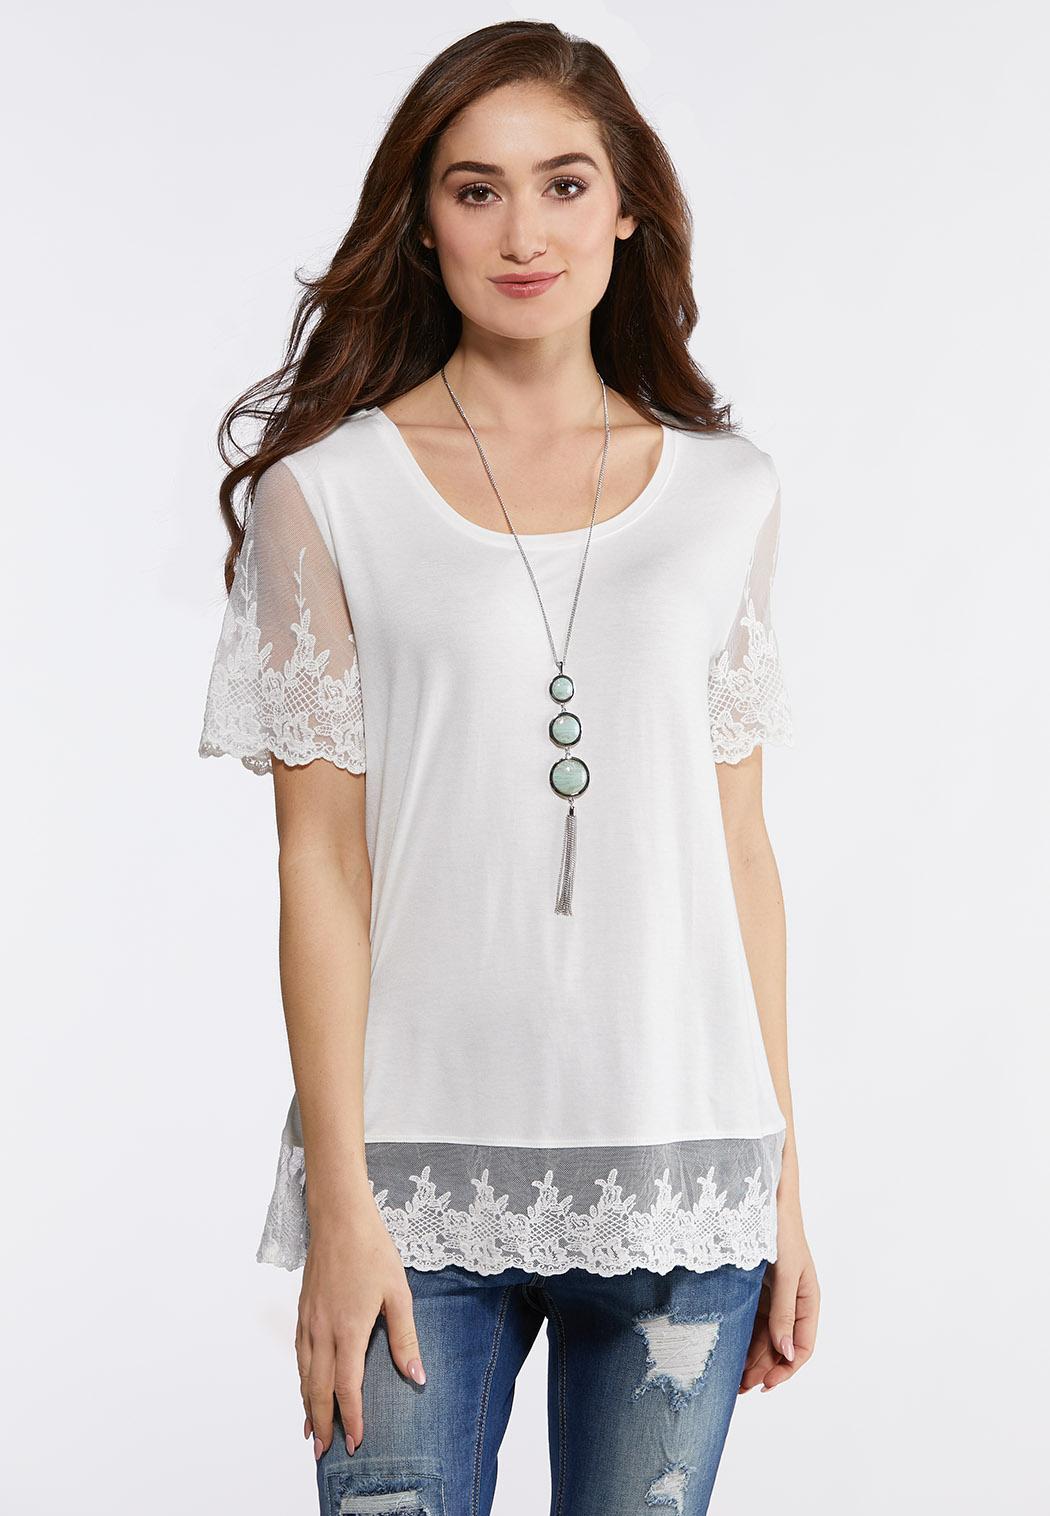 dd316cf90f3 Plus Size Embroidered Mesh Trim Top Tops Cato Fashions